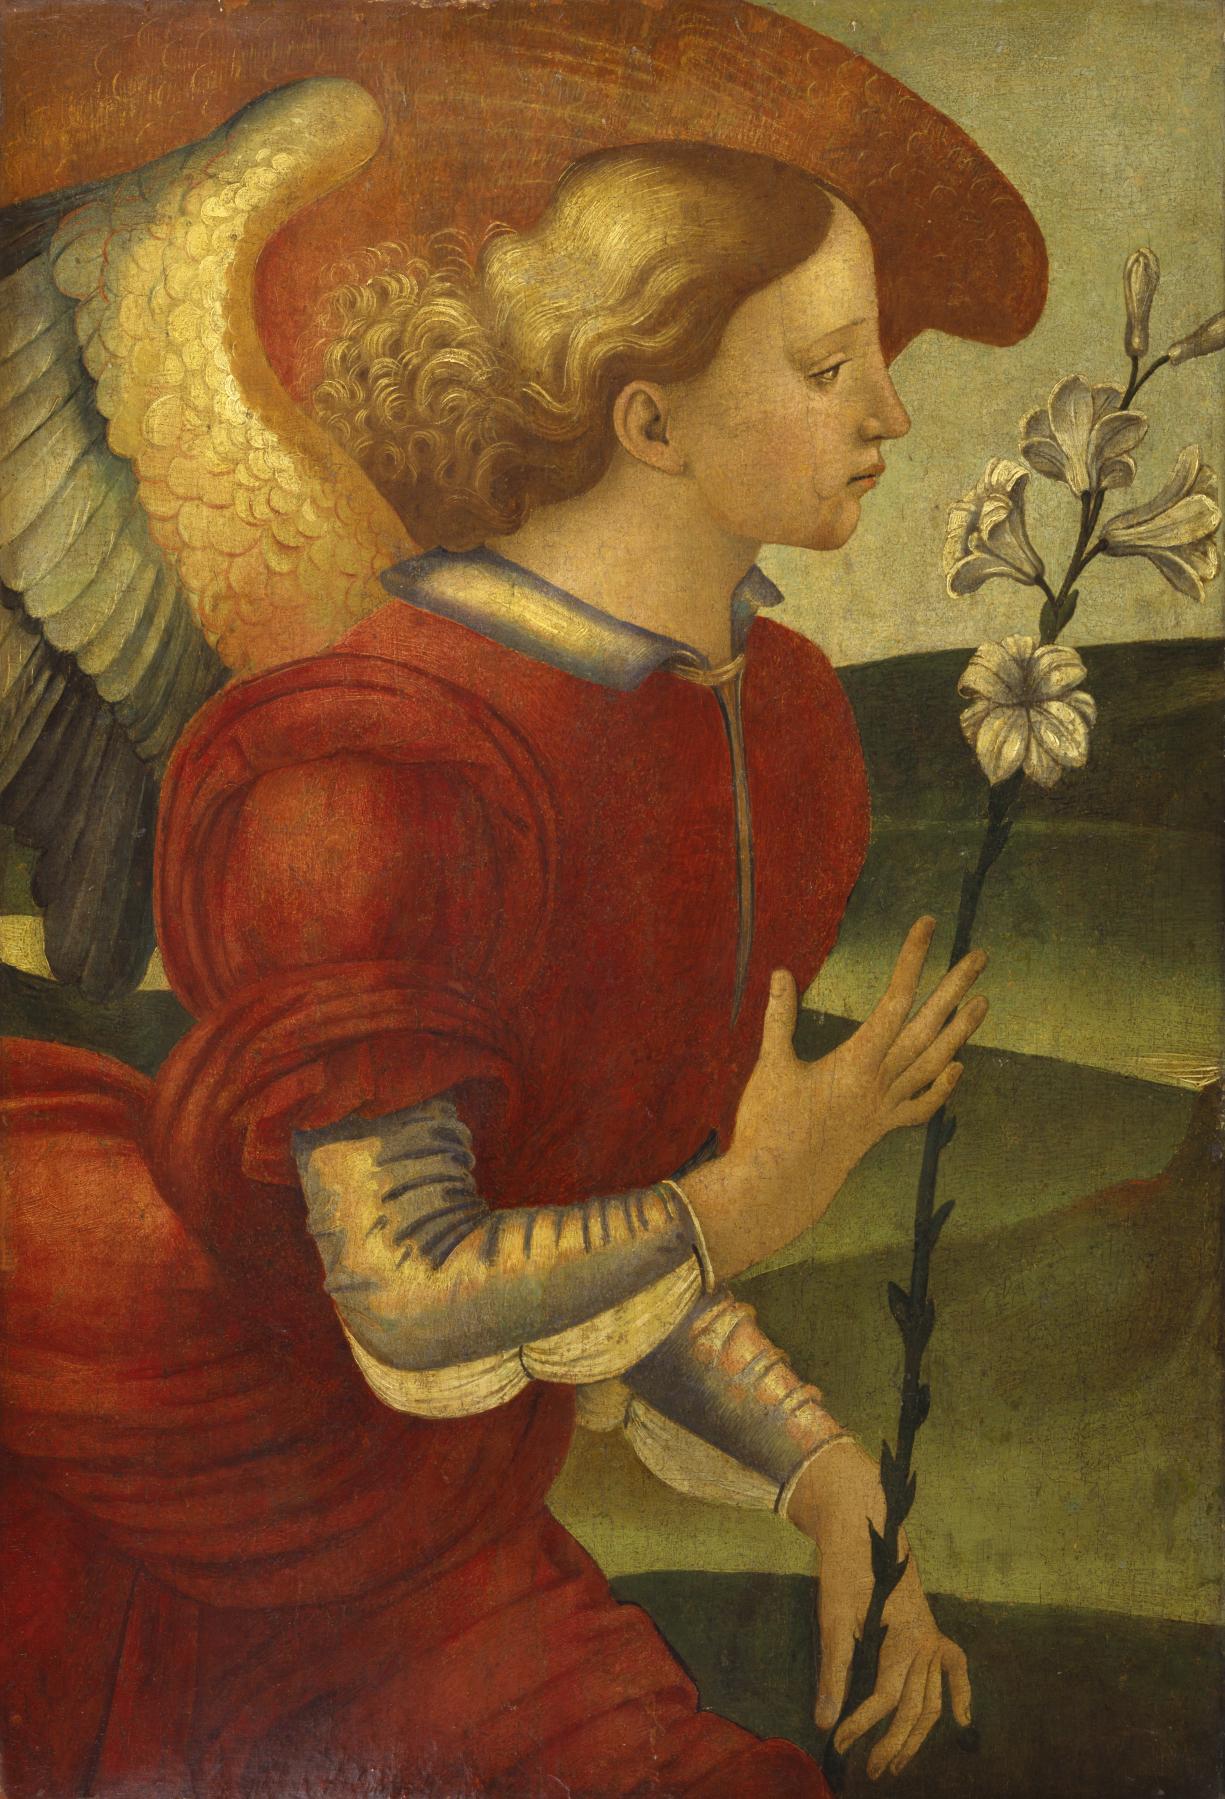 Luca_Signorelli_-The_Archangel_Gabriel-_Walters_37520